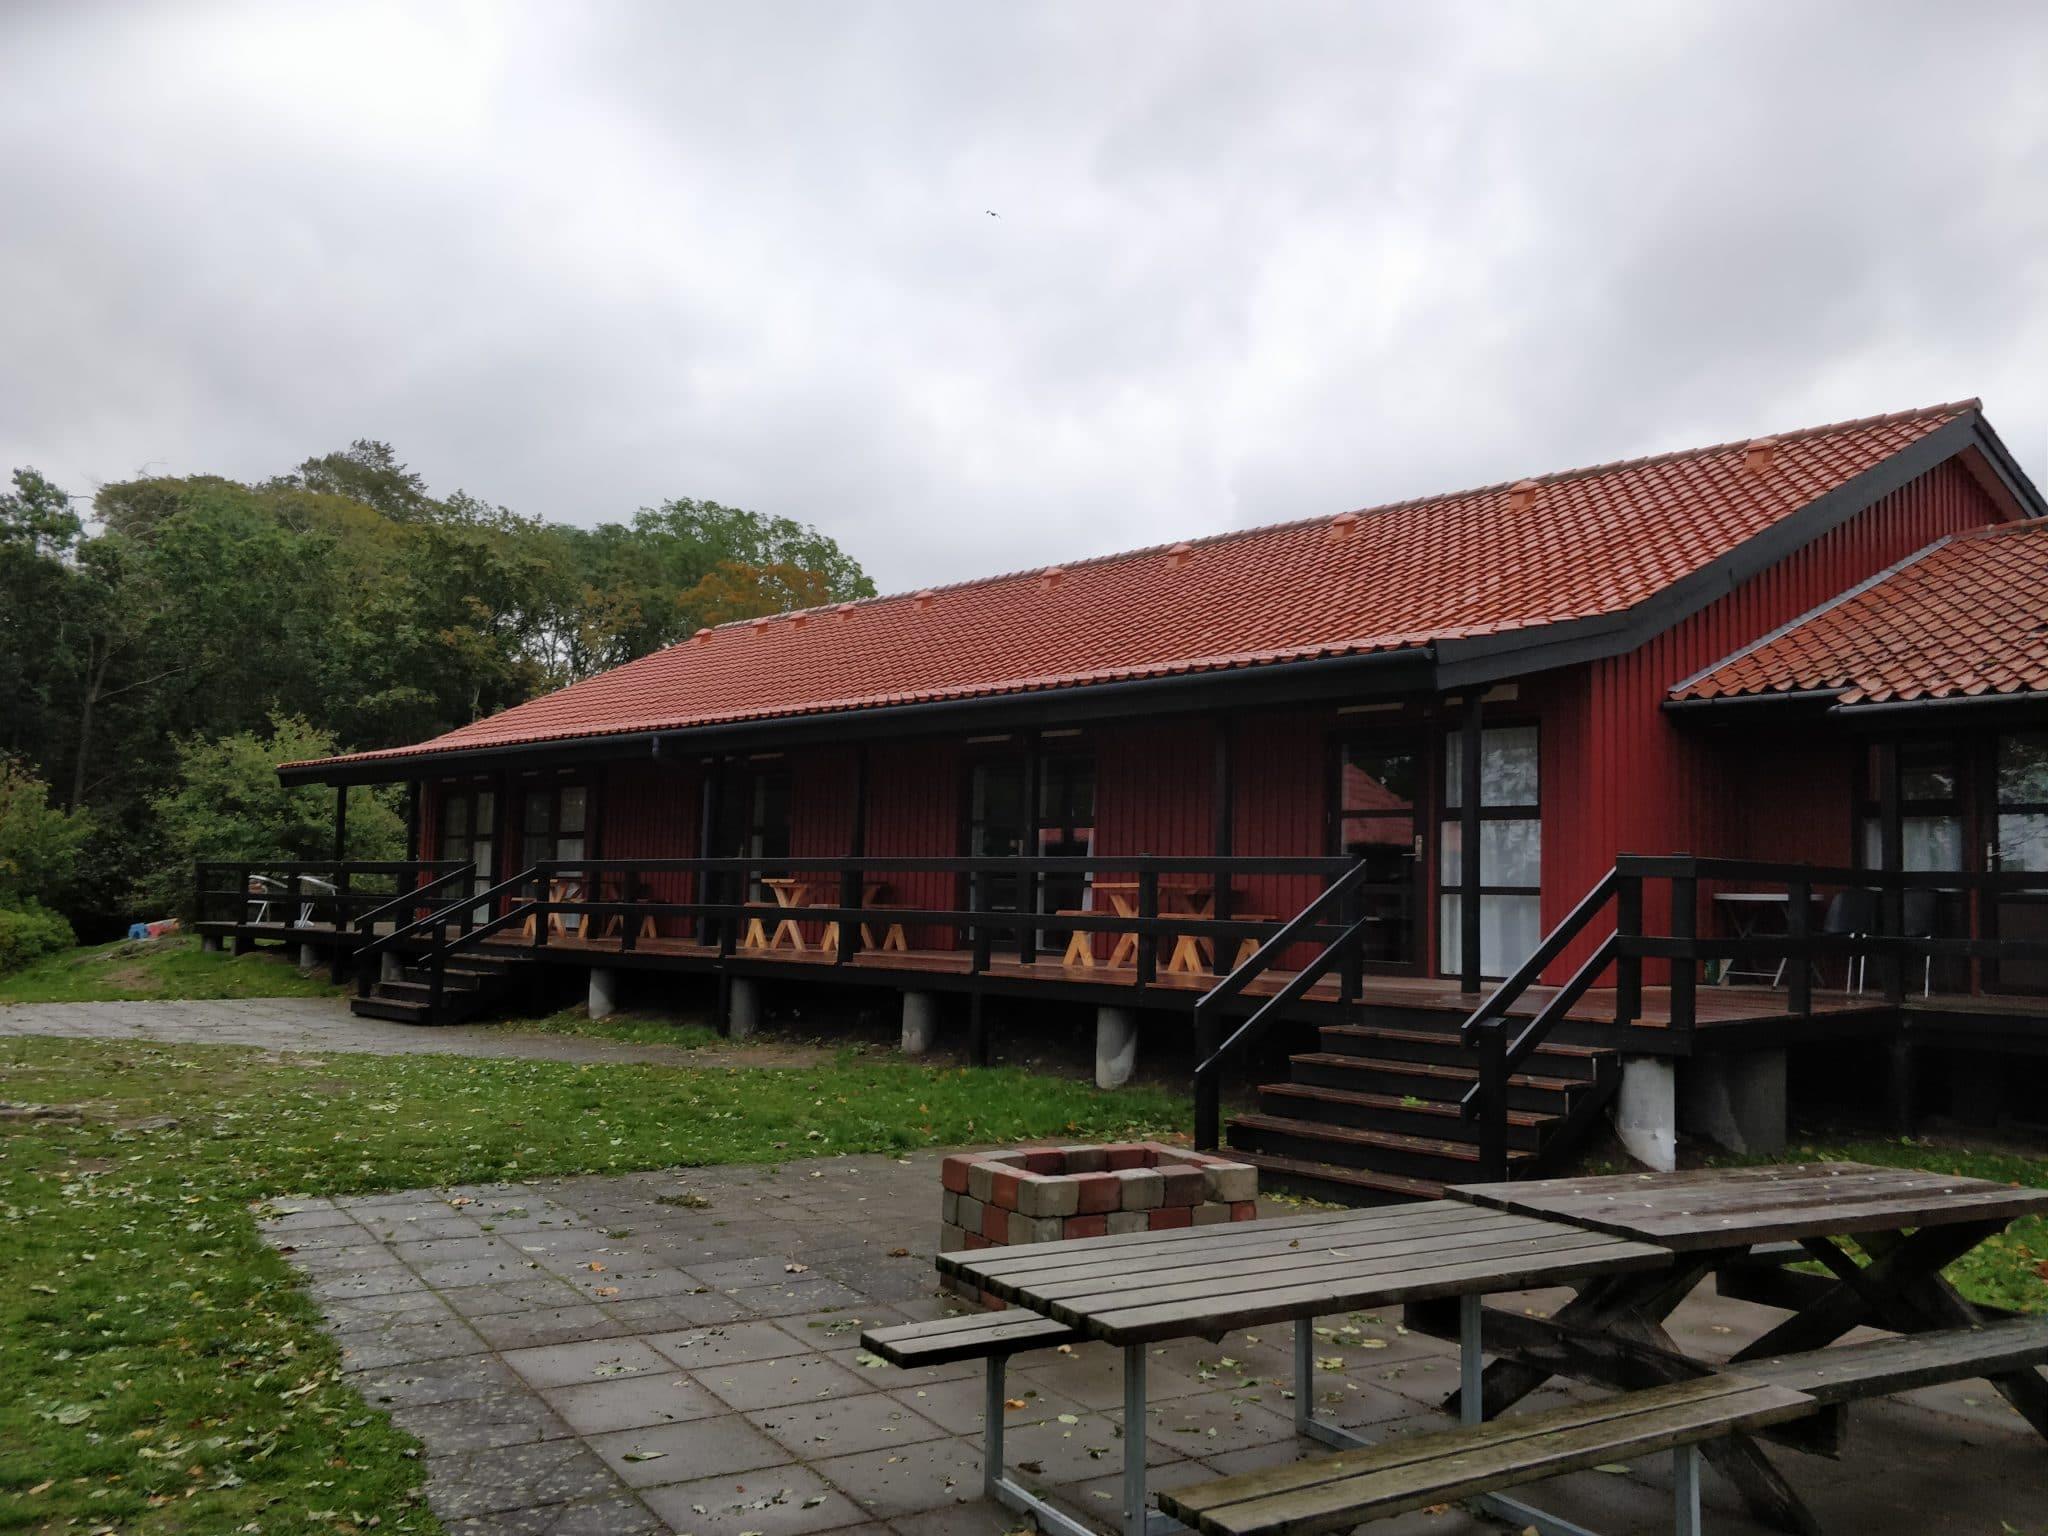 Ny værelsesfløj på Svaneke Vandrehjem